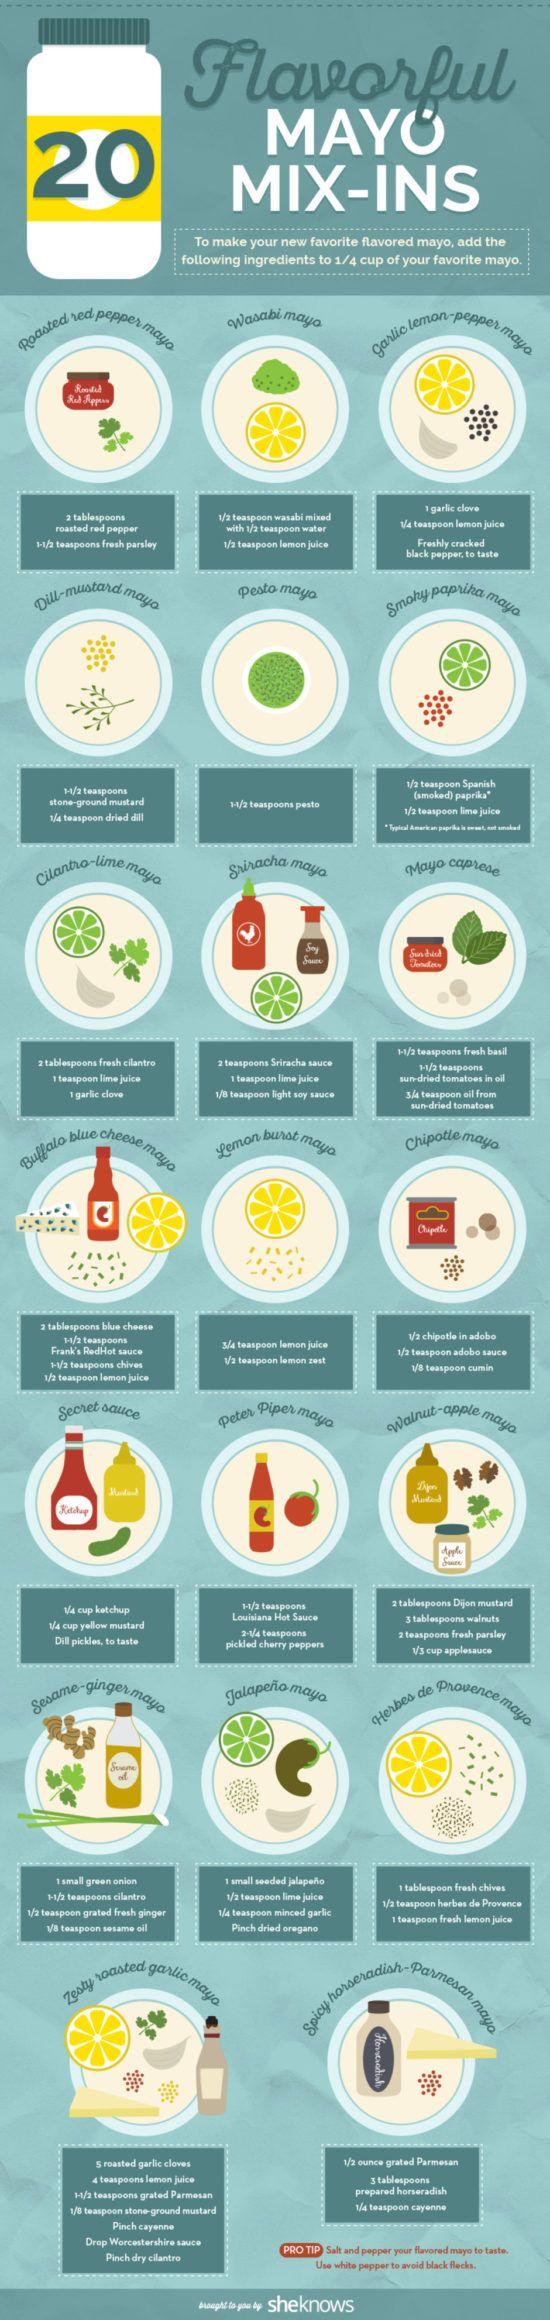 Gordon Ramsay Homemade Mayonnaise Recipe Video